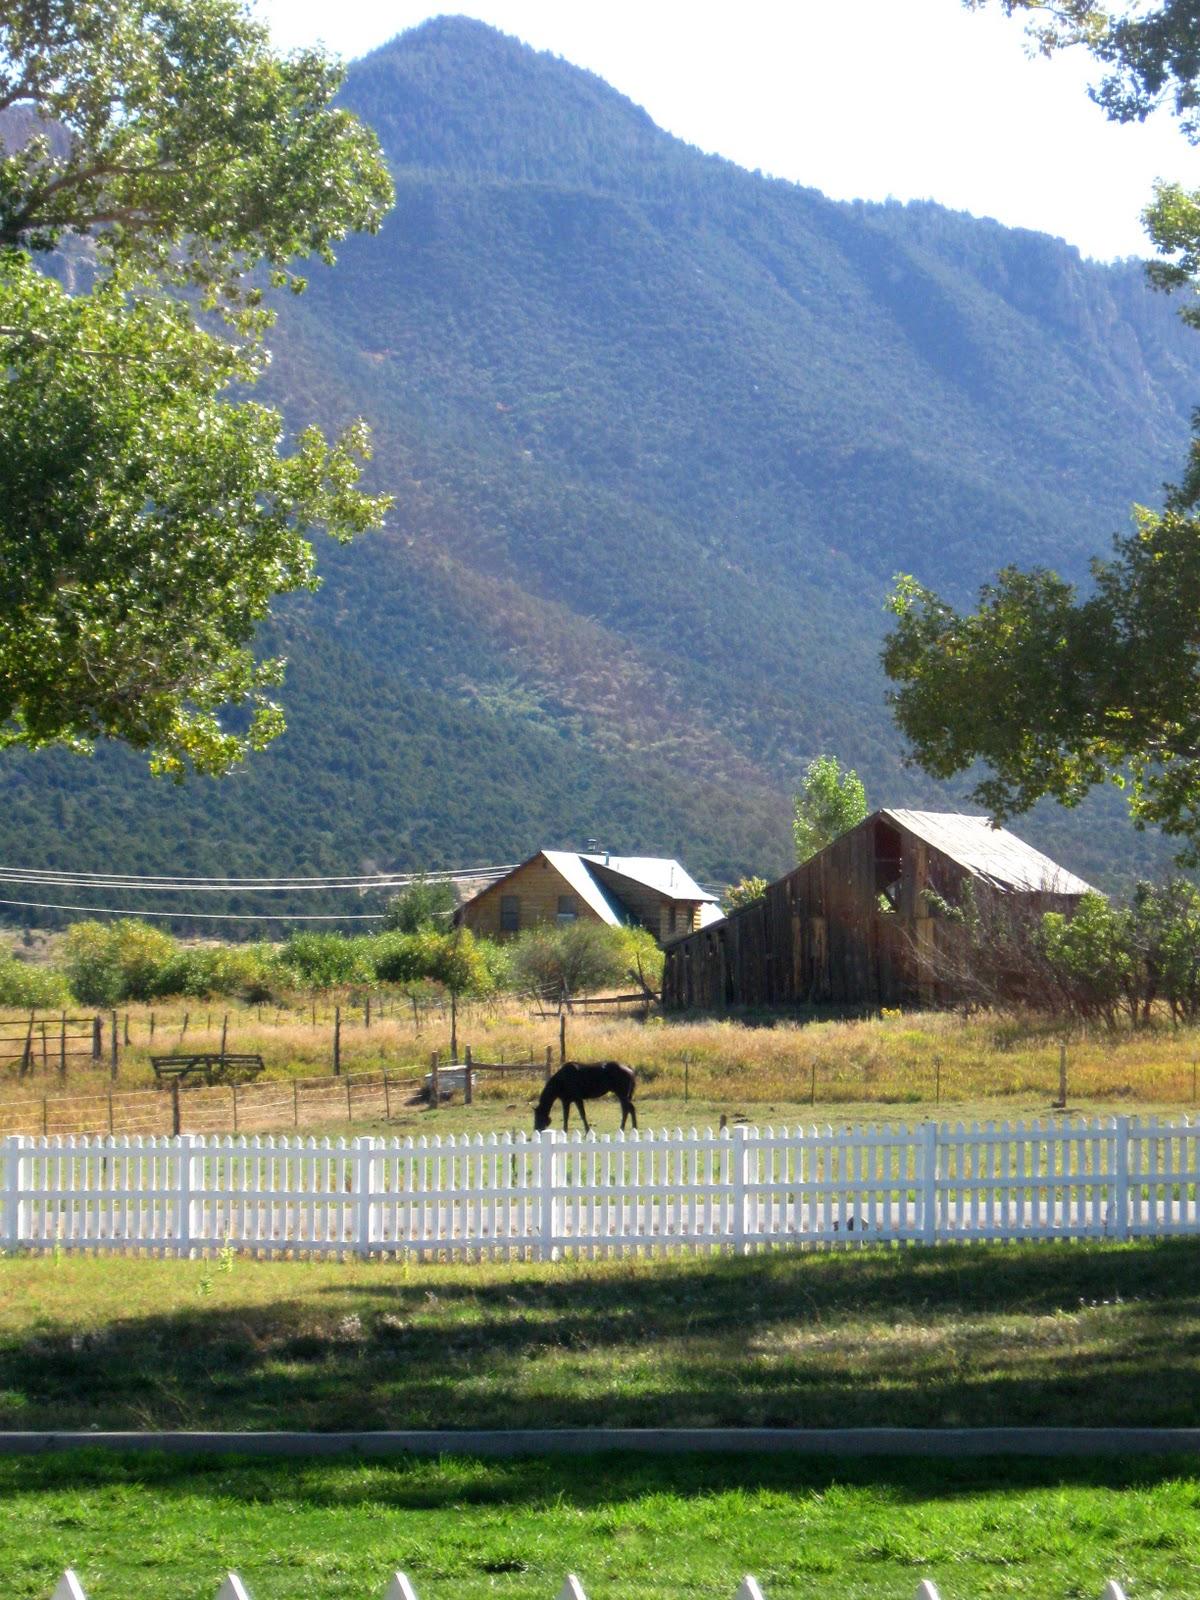 St. George Snapshots: Pine Valley